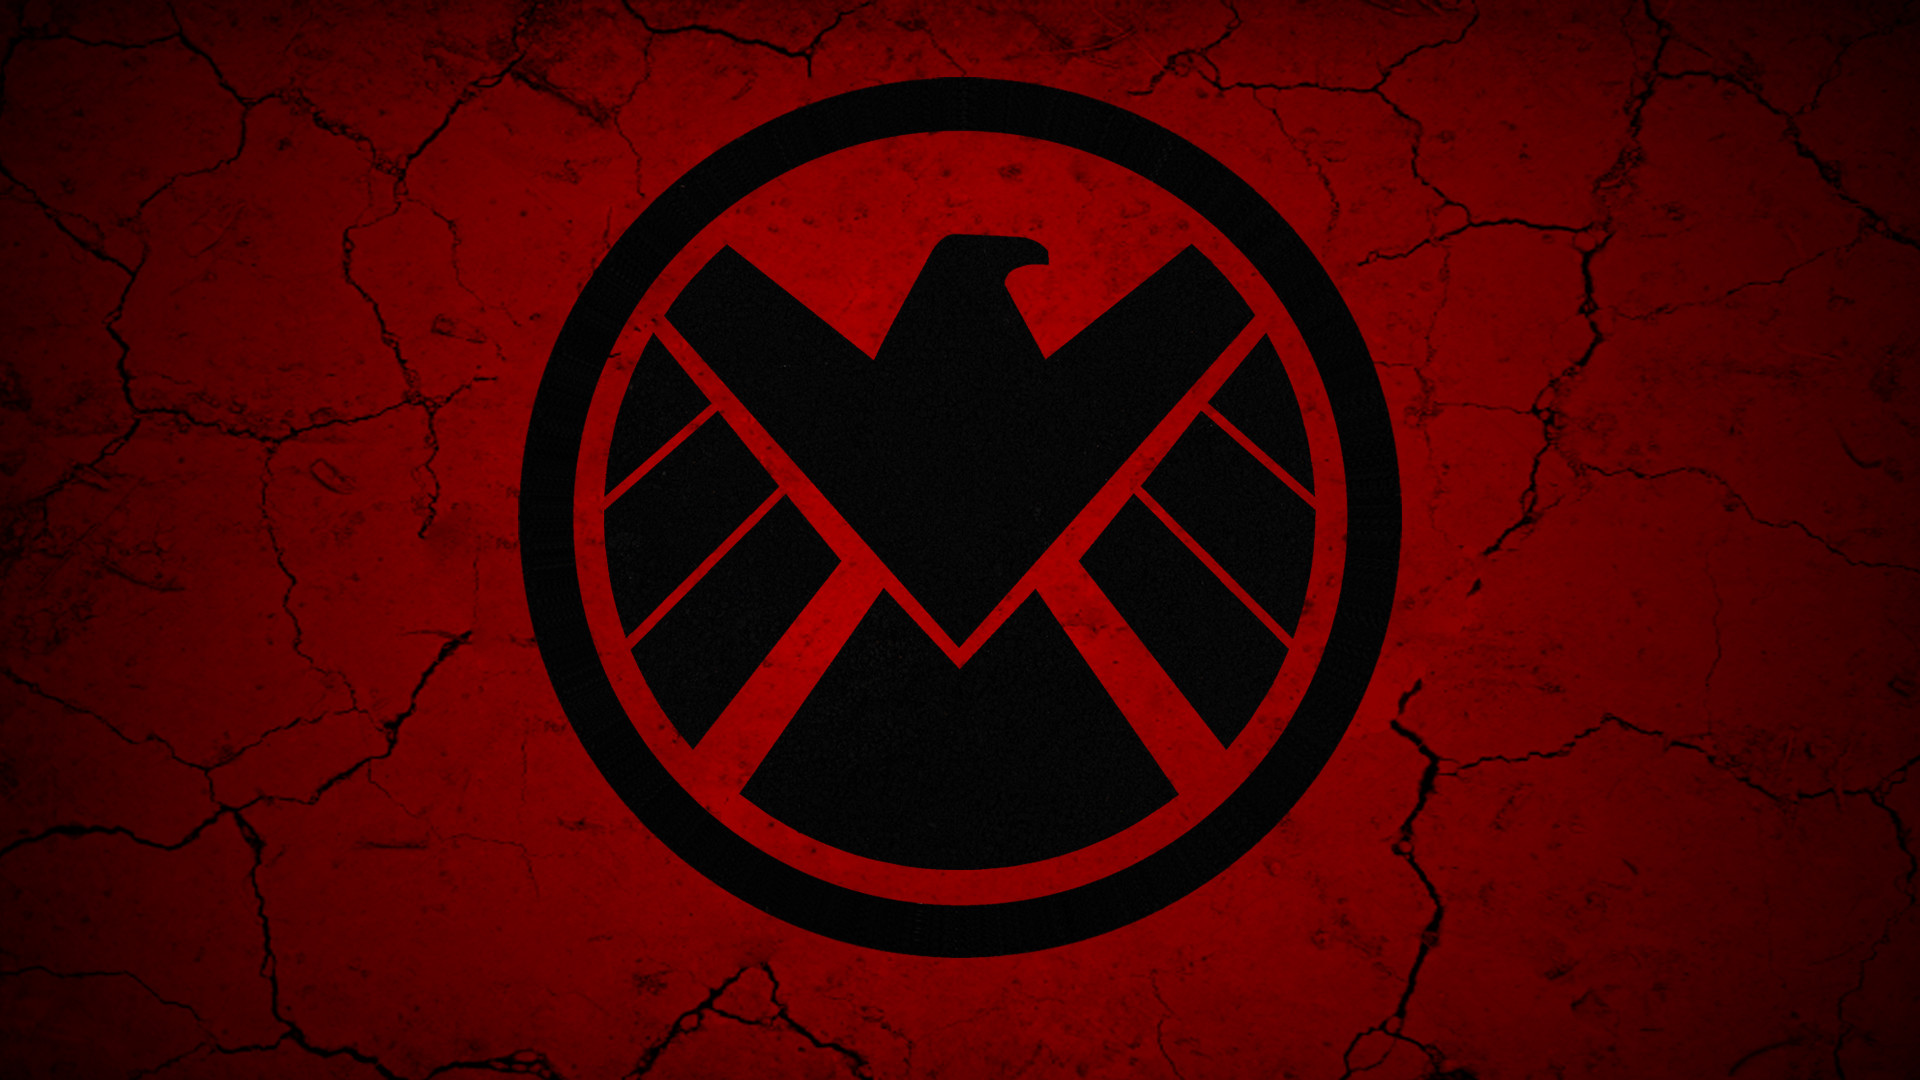 Marvel Hydra Iphone Wallpaper Hydra iphone w…